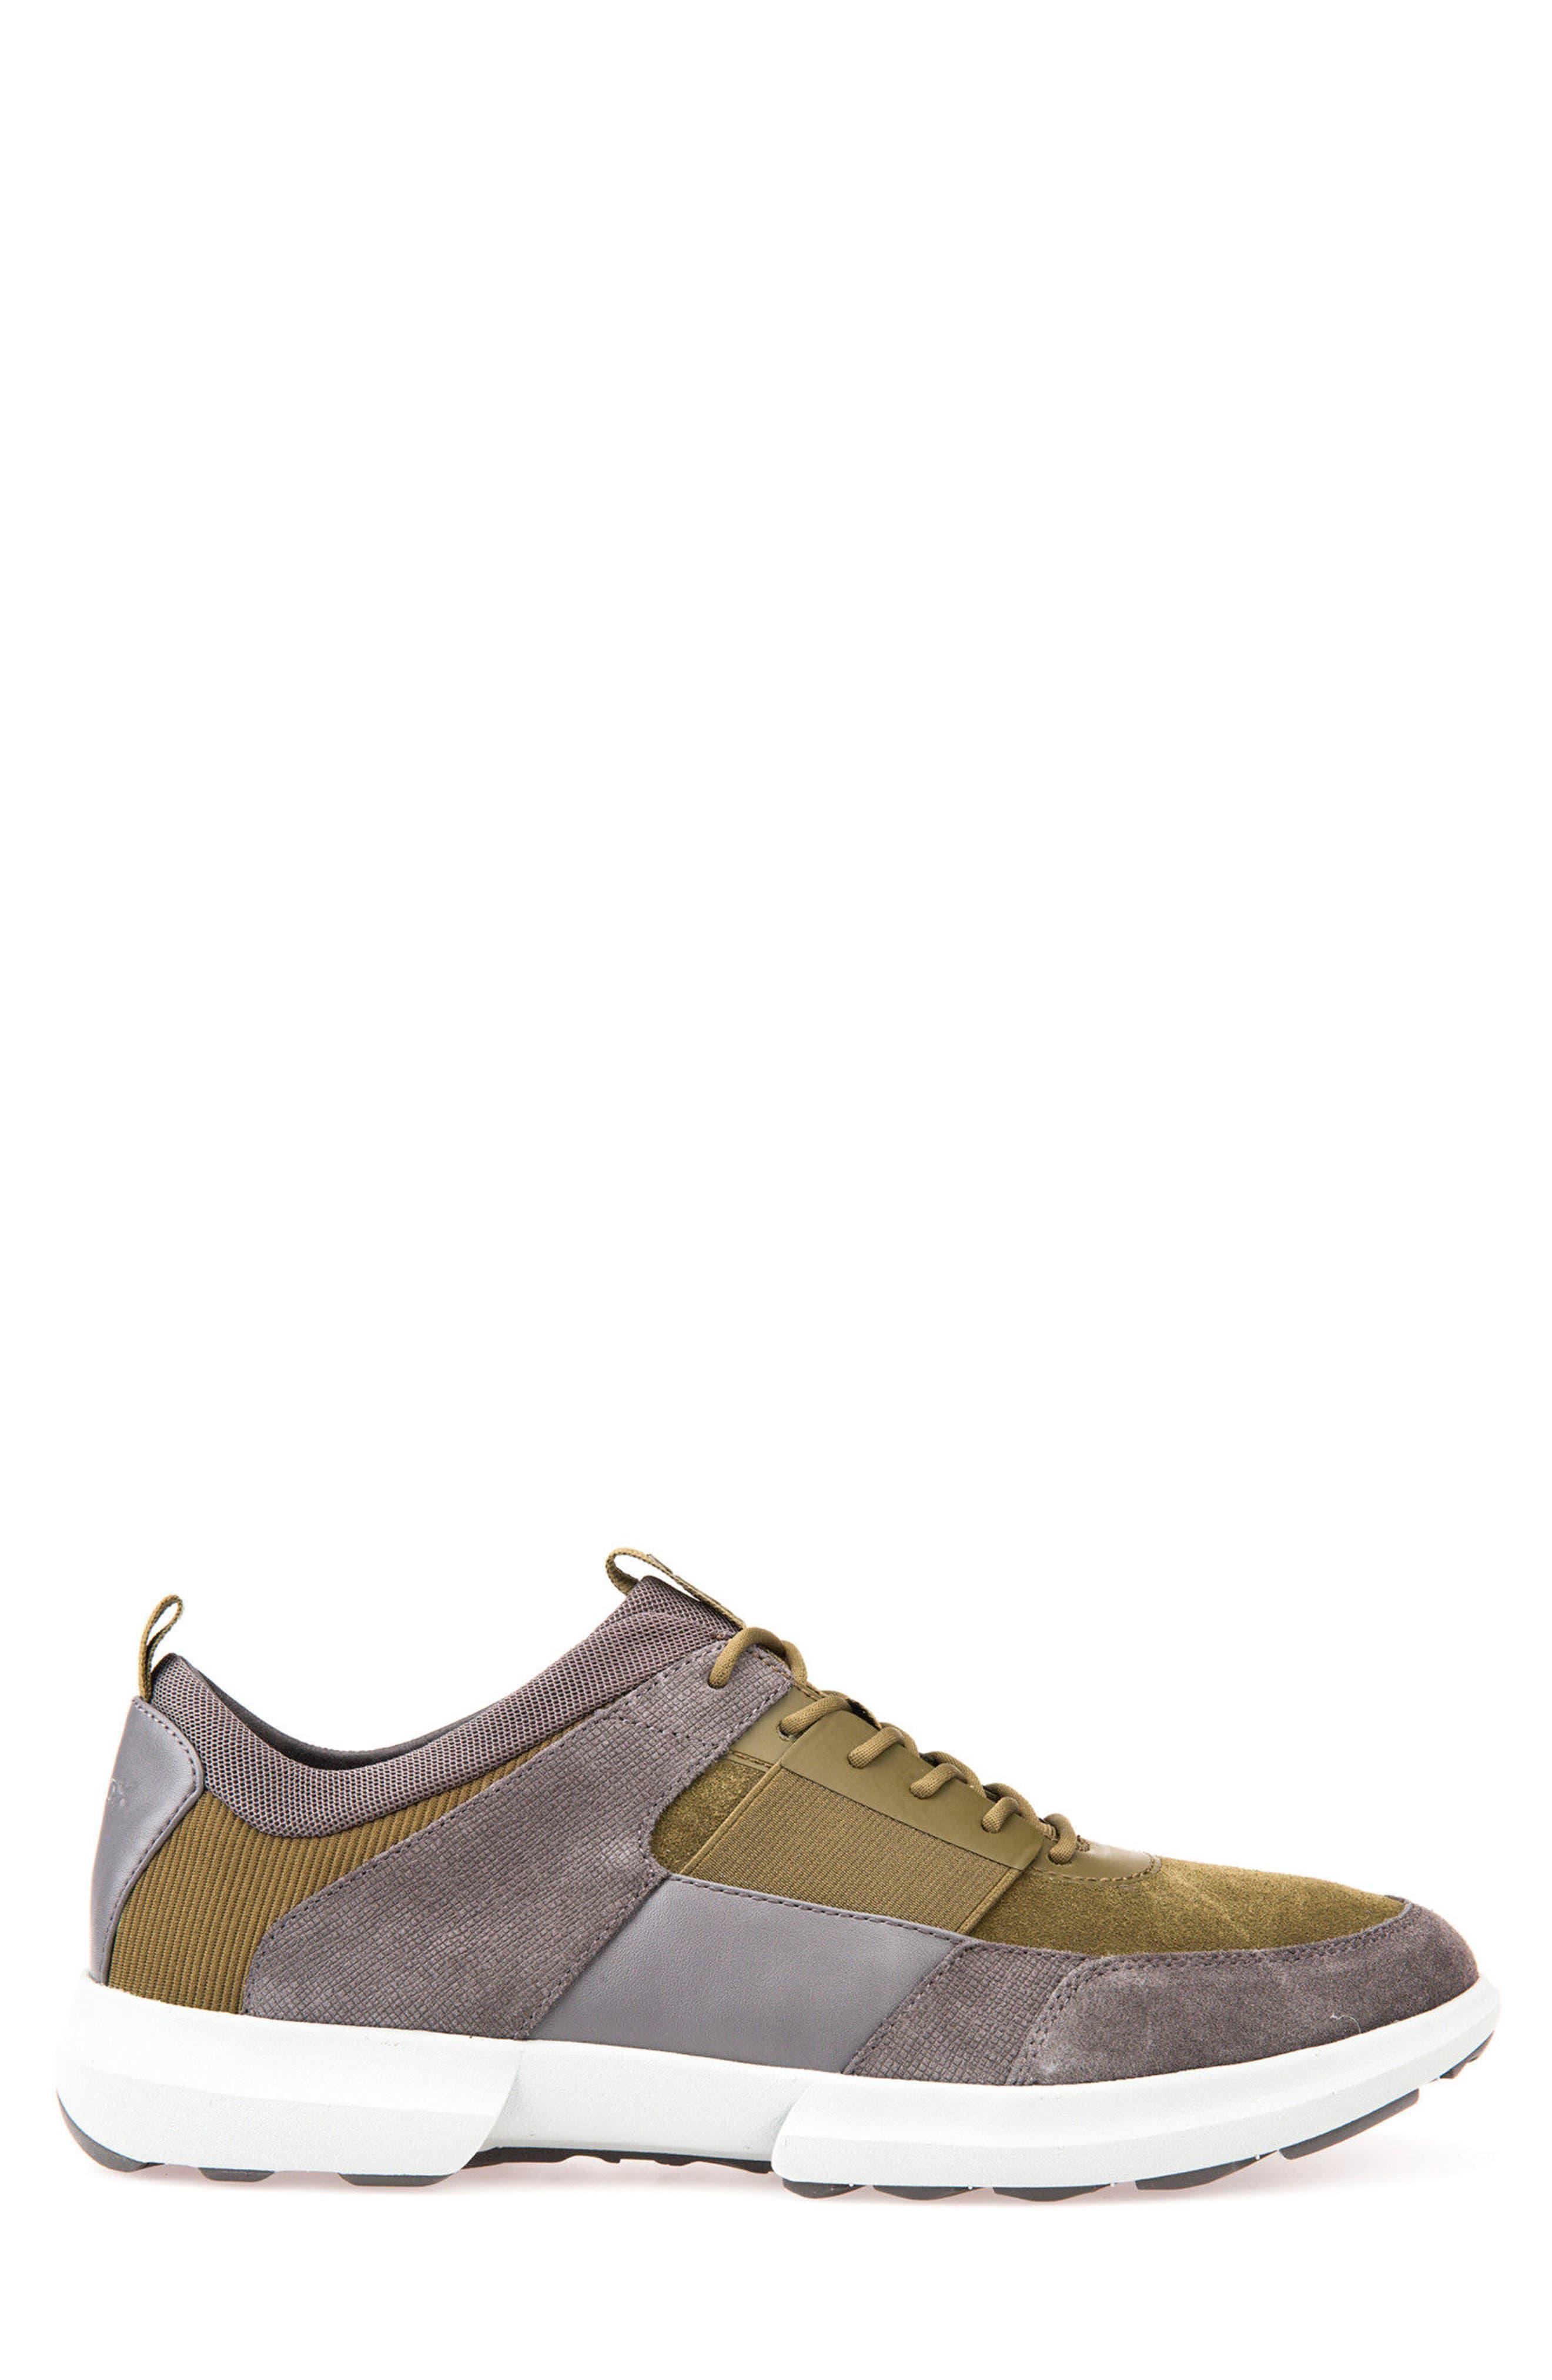 Traccia 5 Sneaker,                             Alternate thumbnail 5, color,